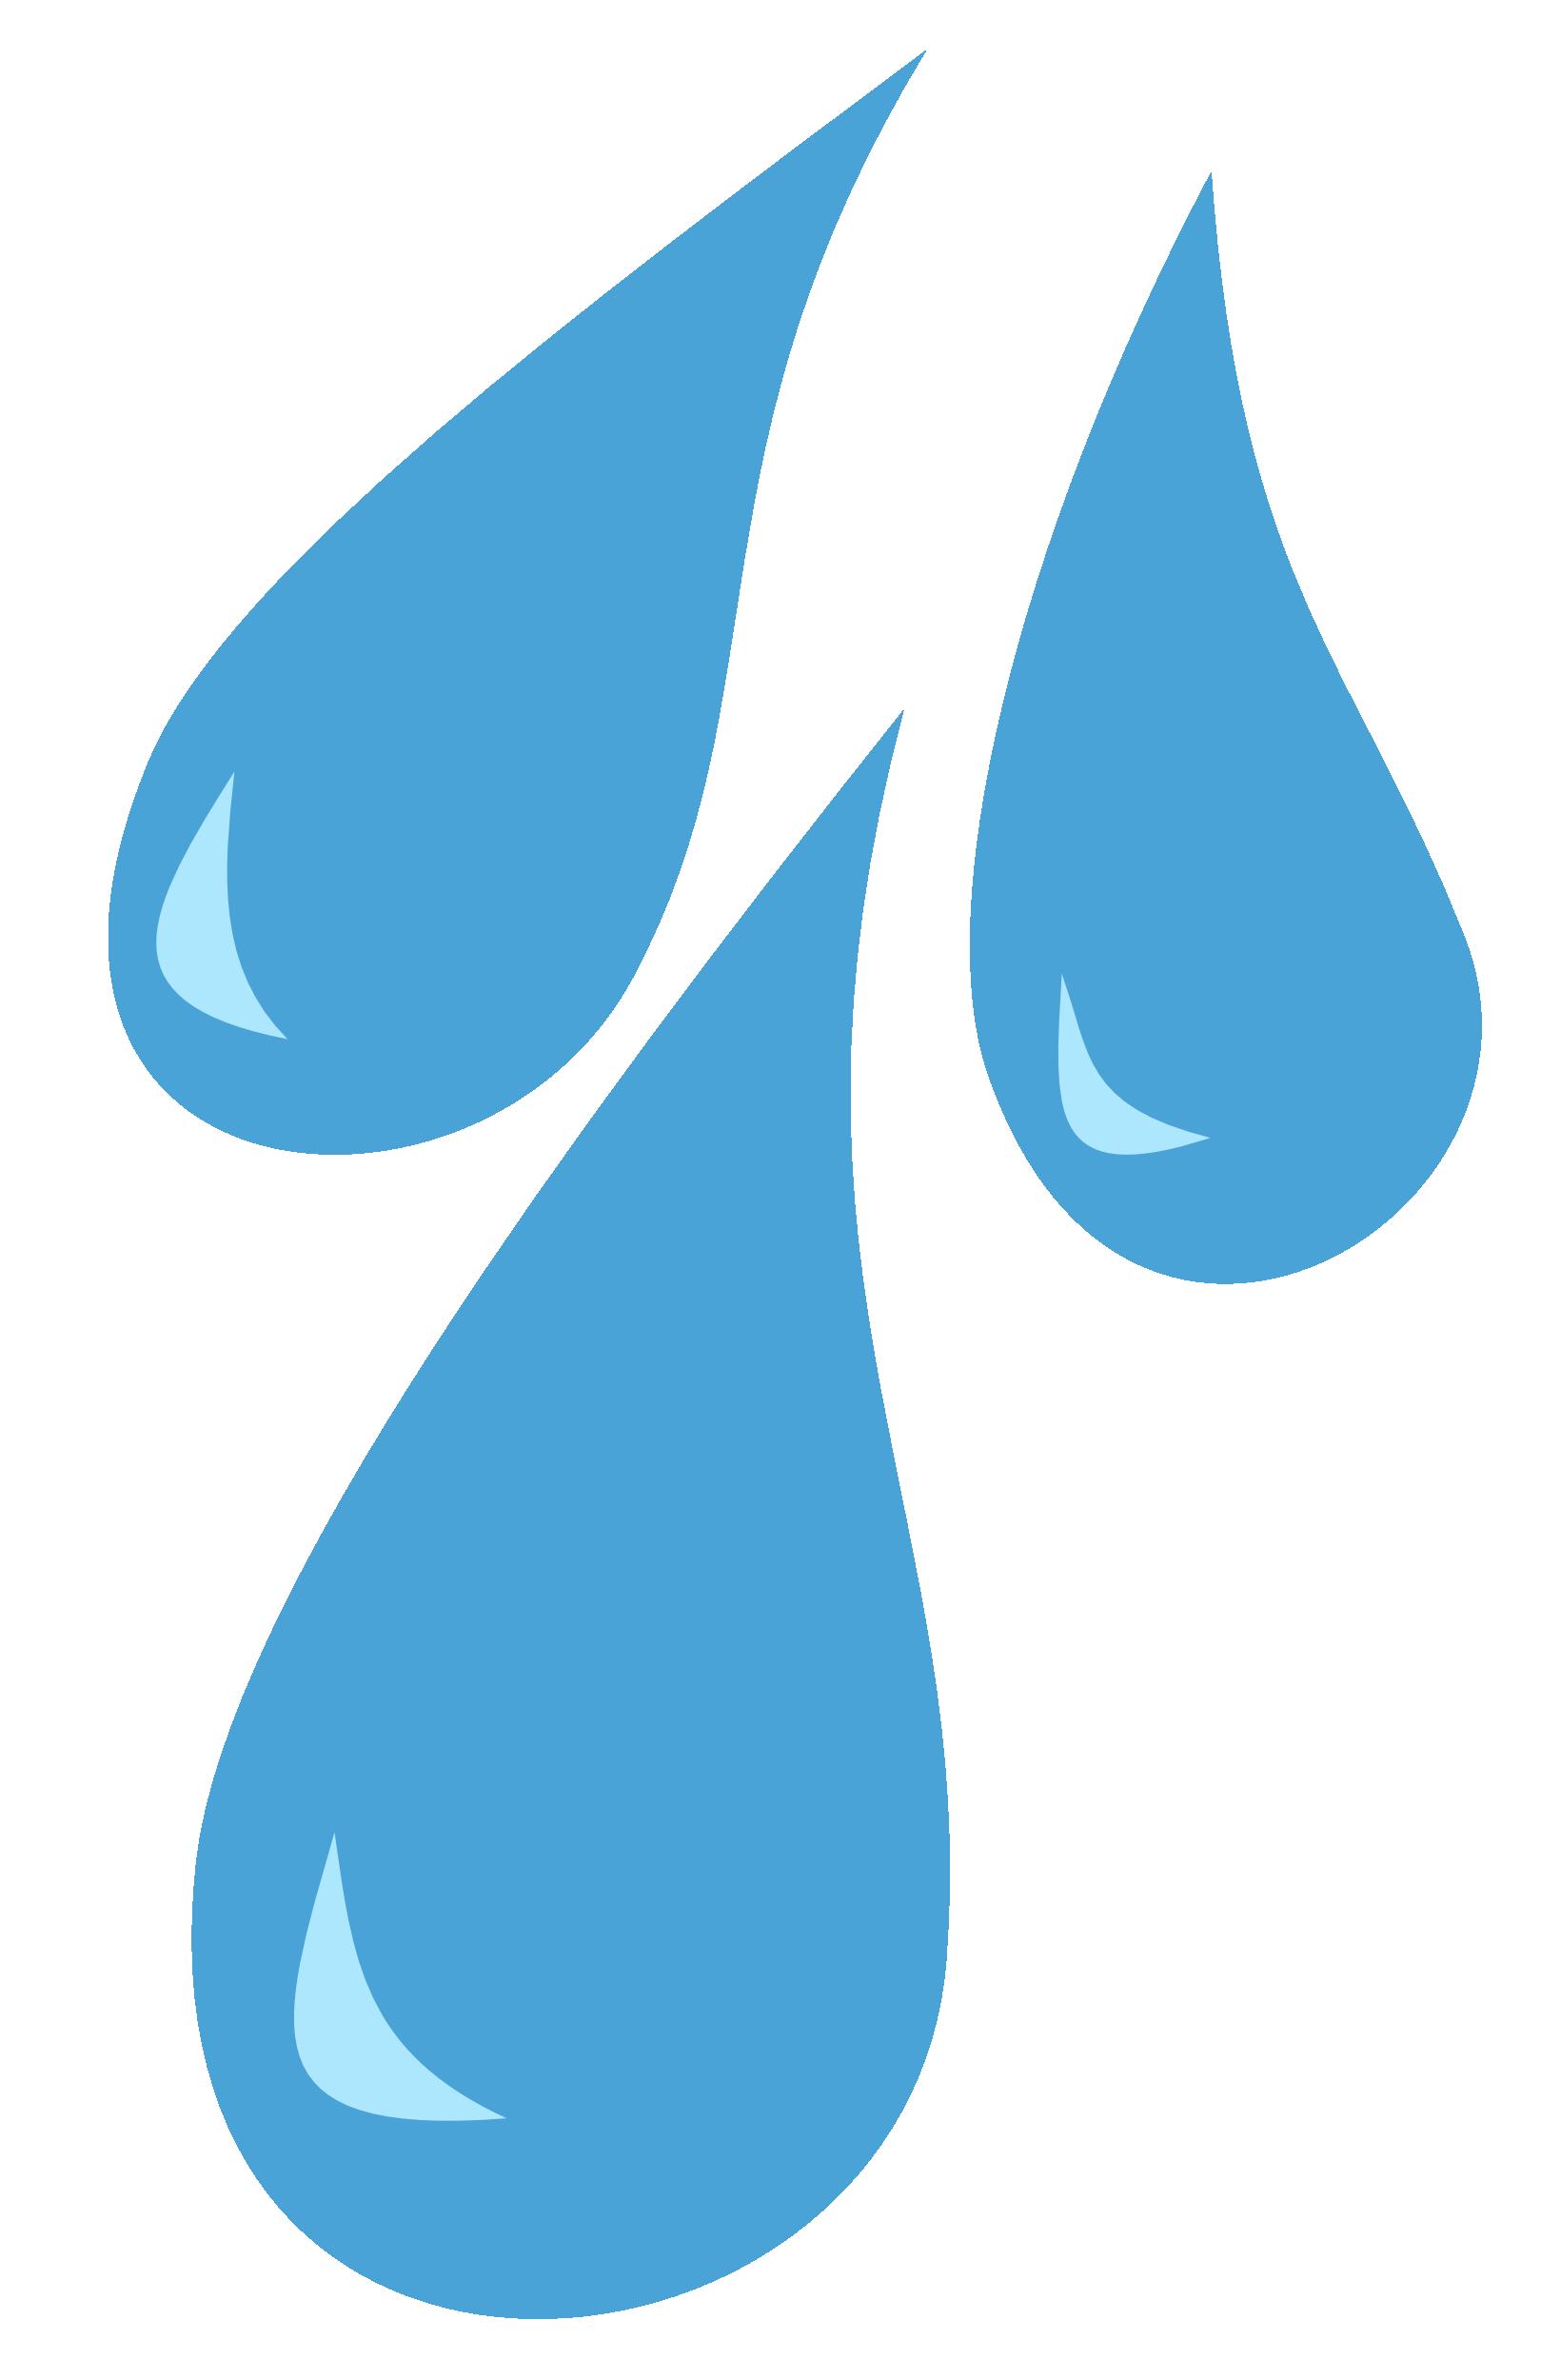 Clipartbest Com - Clipart Raindrops